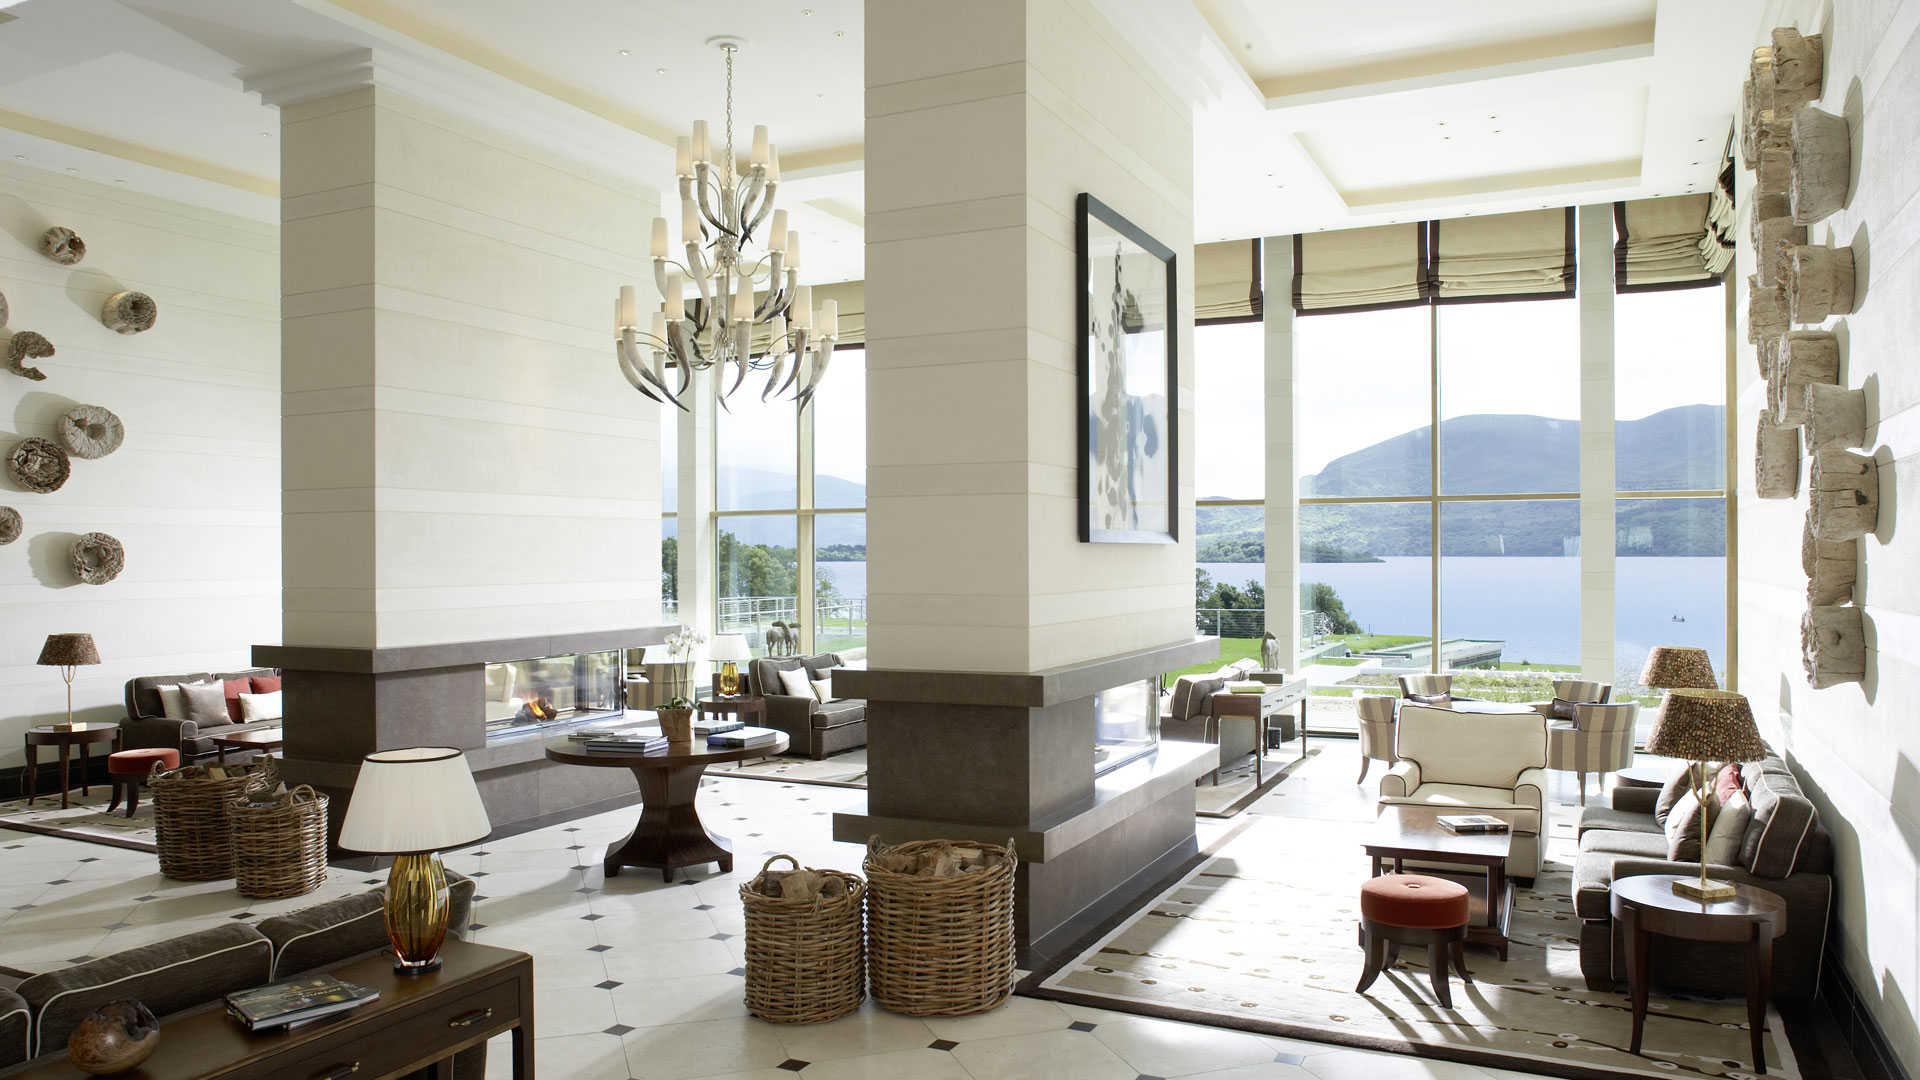 europe hotel lobby-with-lake-background.jpg